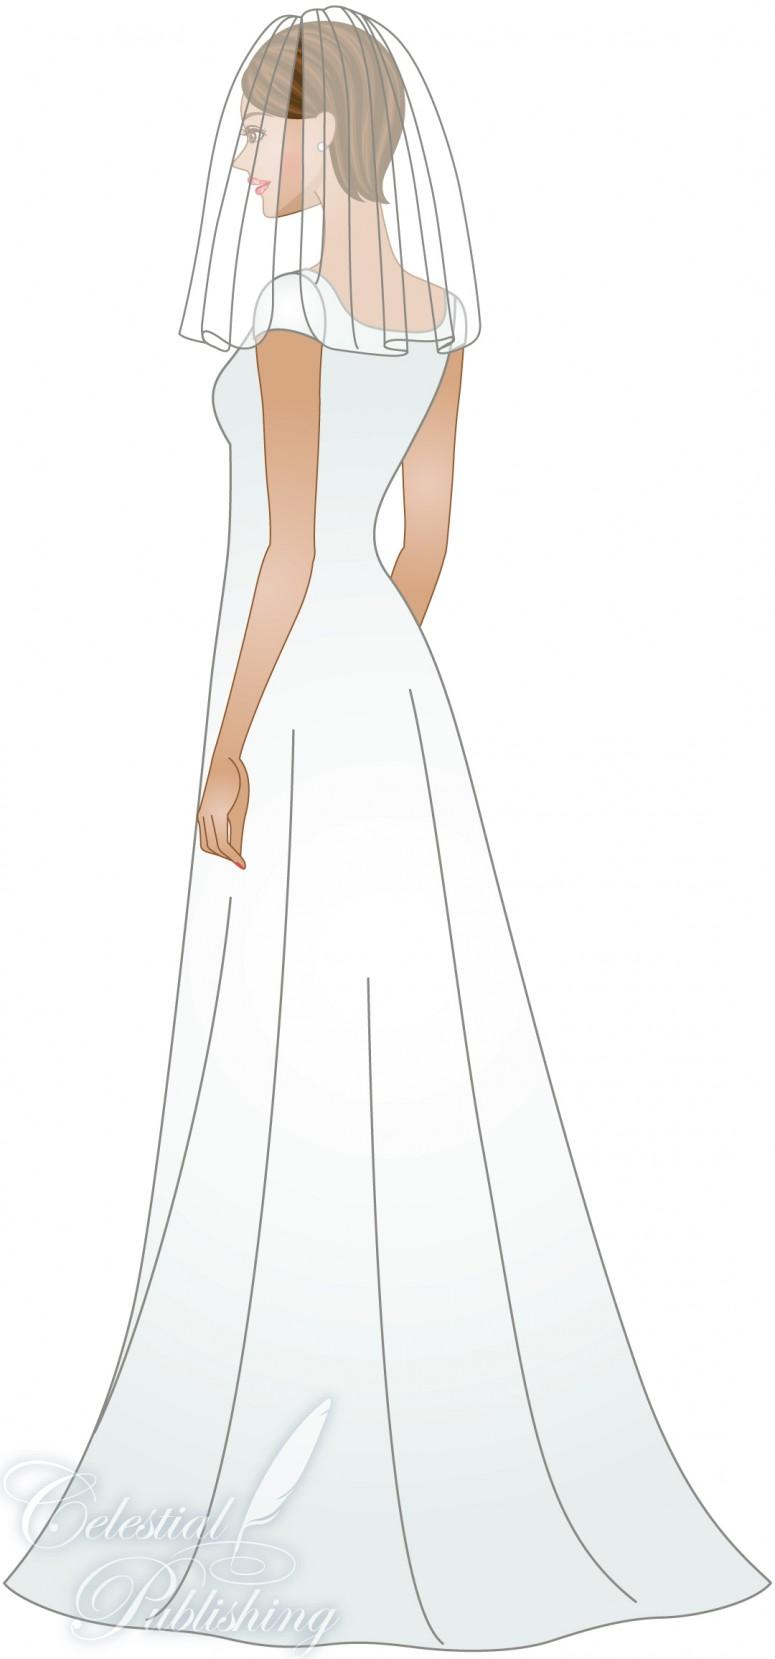 Modest Wedding Dresses, LDS temple weddings, WeddingLDS.com's signature bride modeling blusher veil